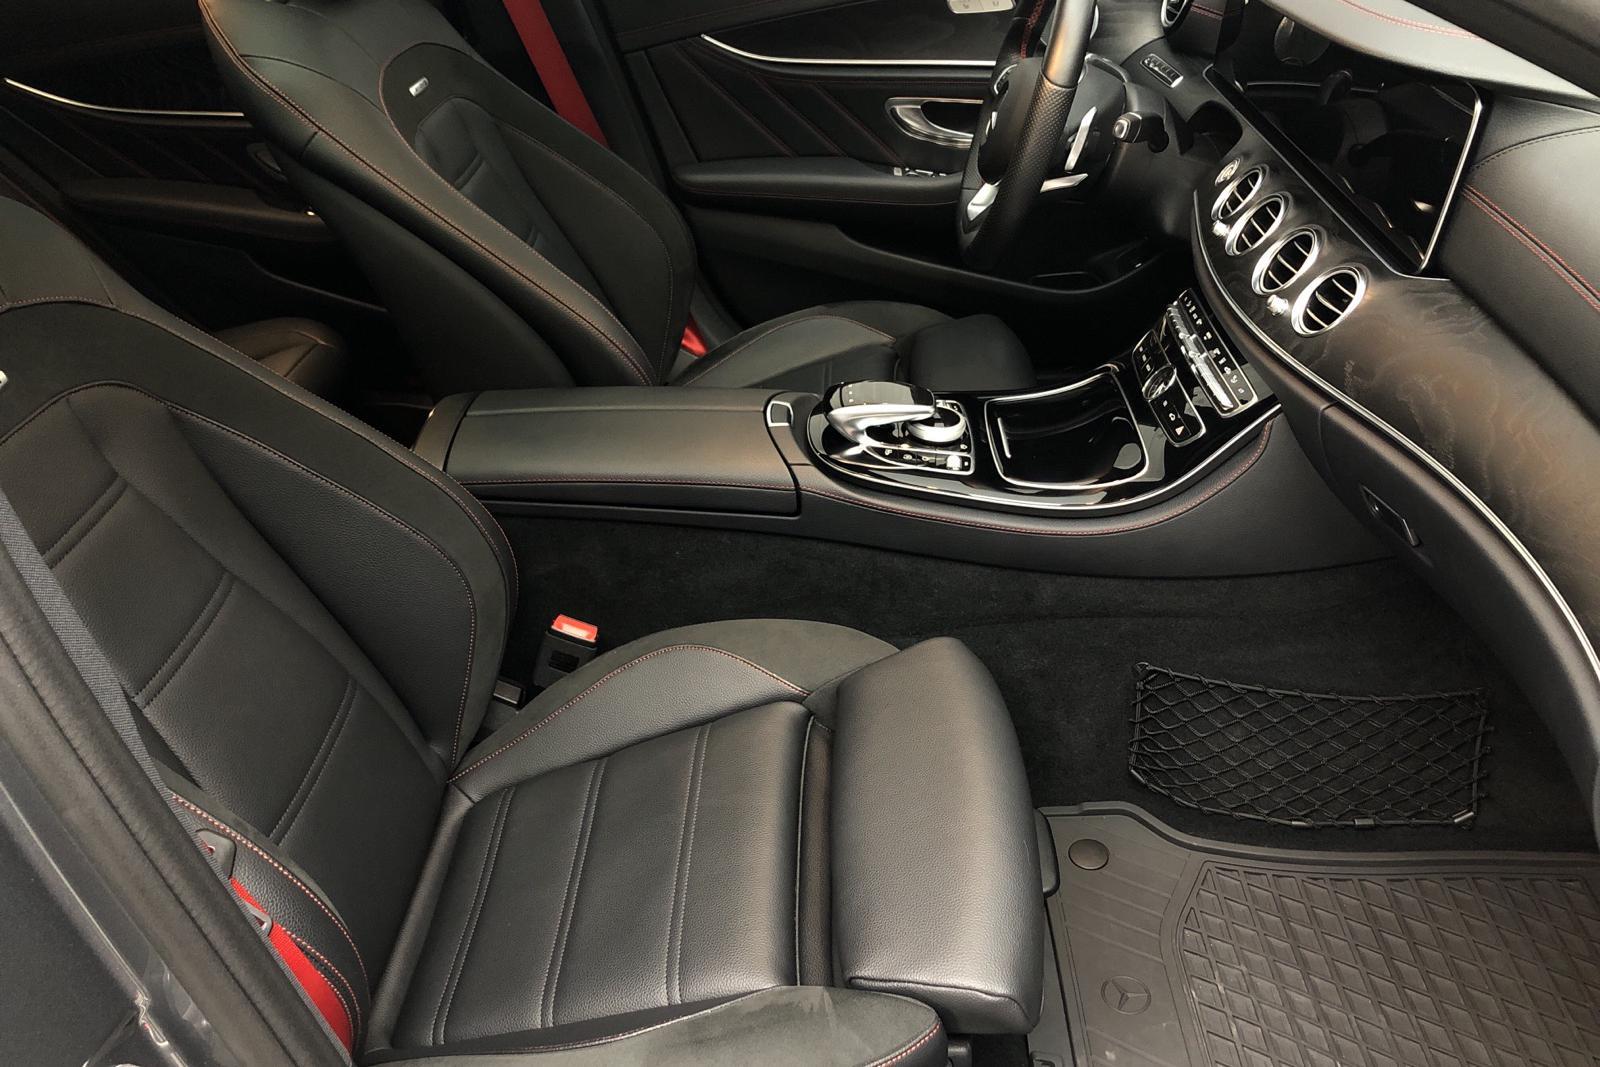 Mercedes E 43 AMG 4MATIC Sedan W213 (401hk) - 2 902 mil - Automat - grå - 2018